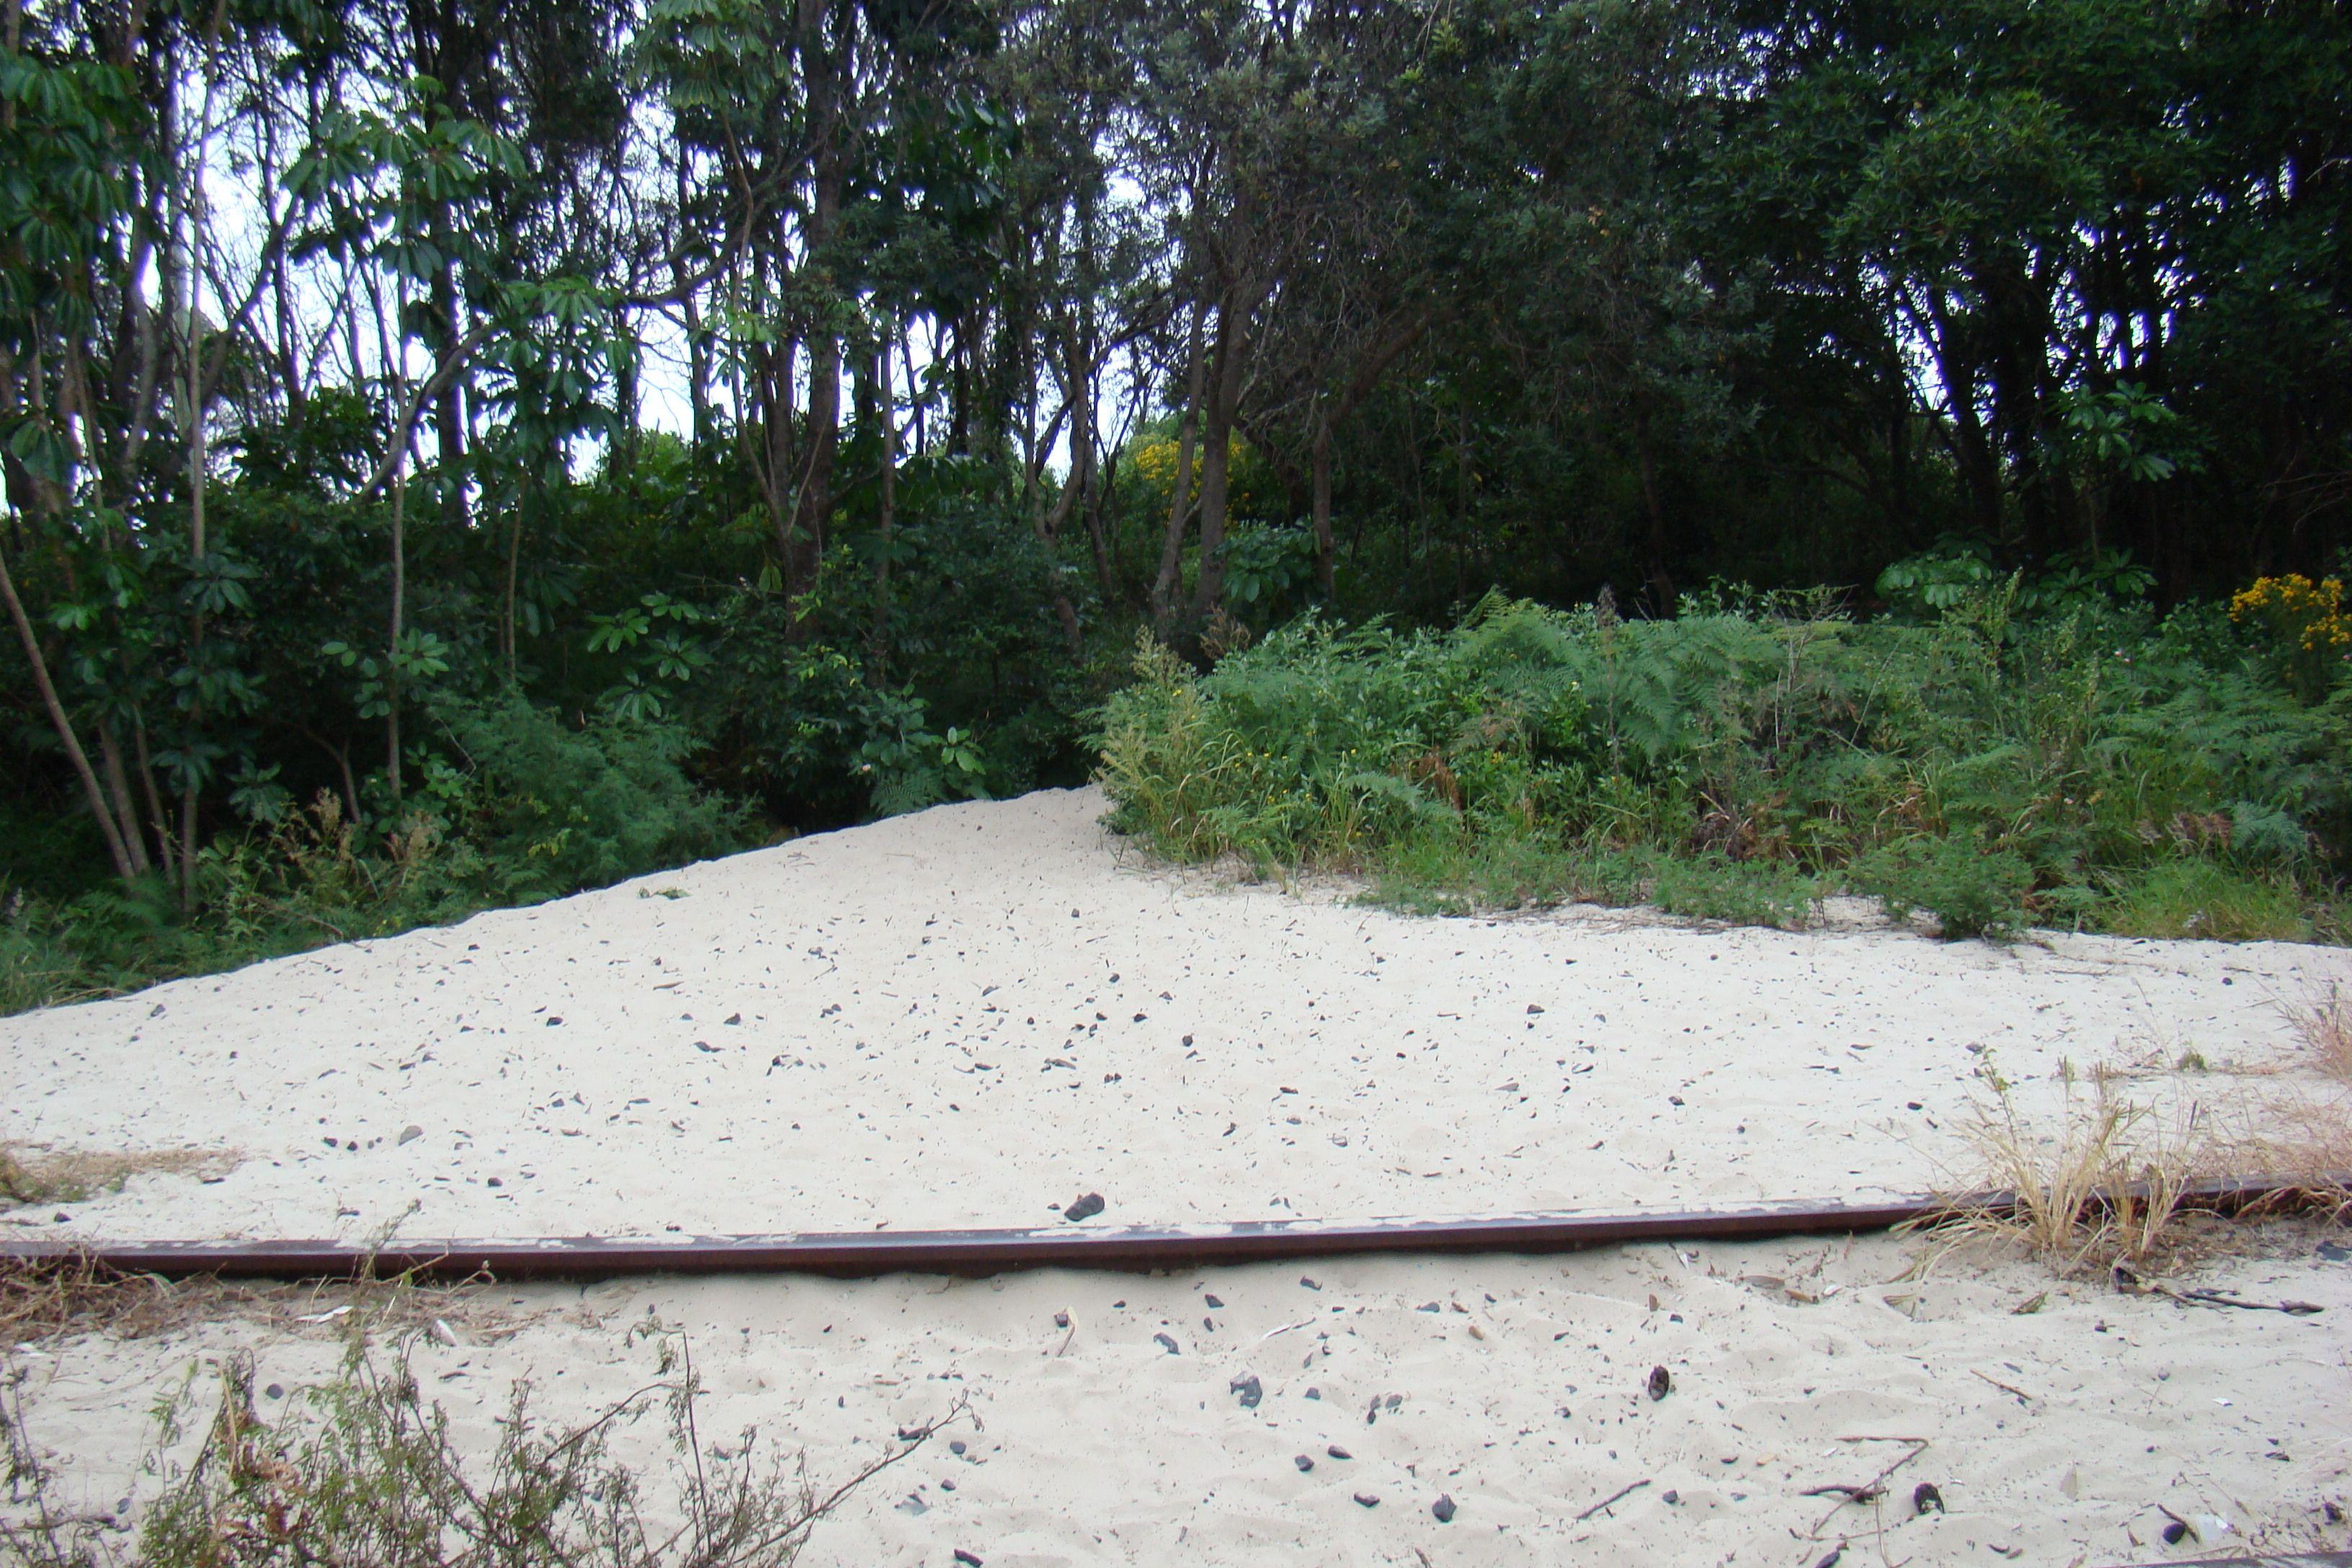 Backpackers Inn (Byron Bay // Australien): Direkter Zugang zum Strand